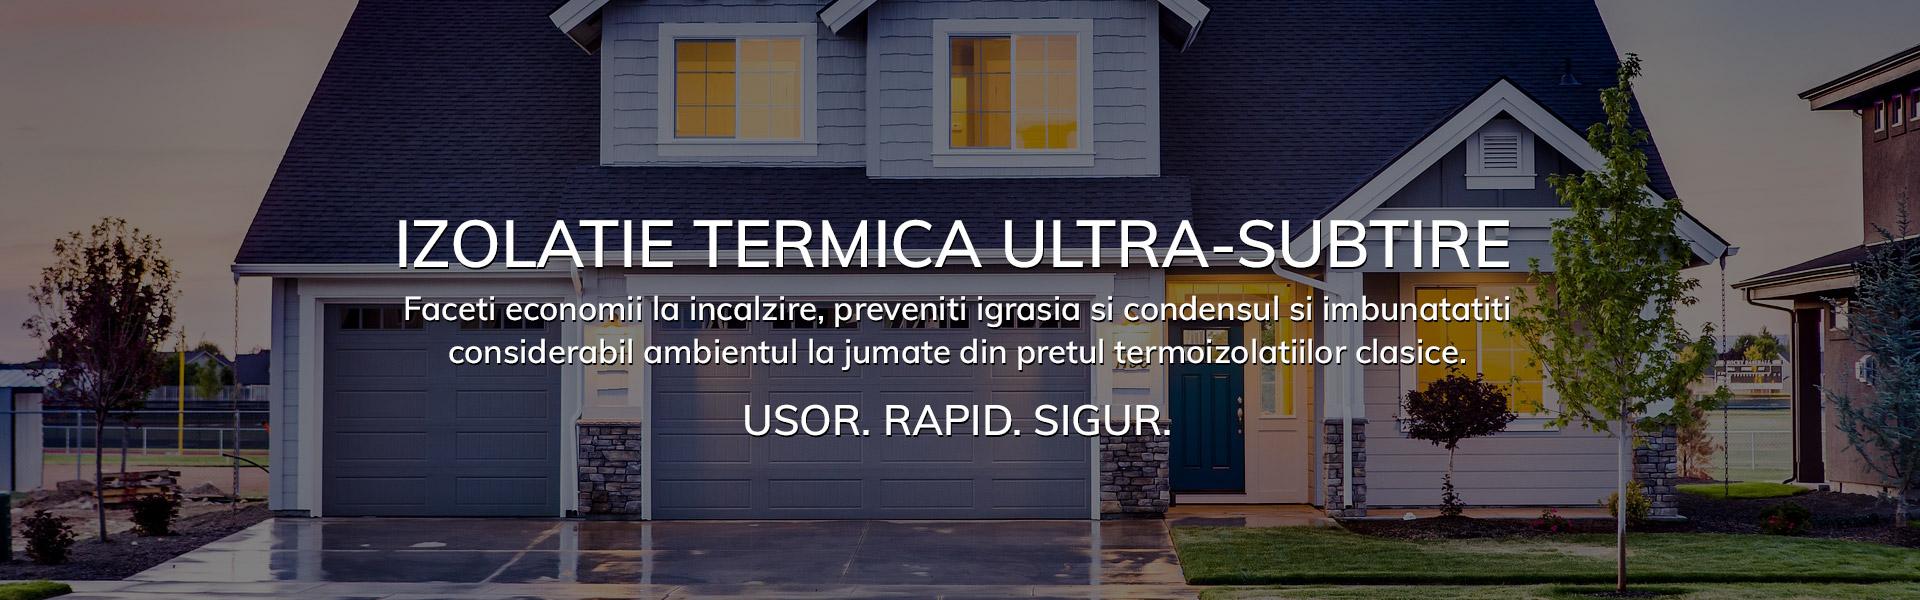 Izolatie termica inovatoare ULTRA-SUBTIRE